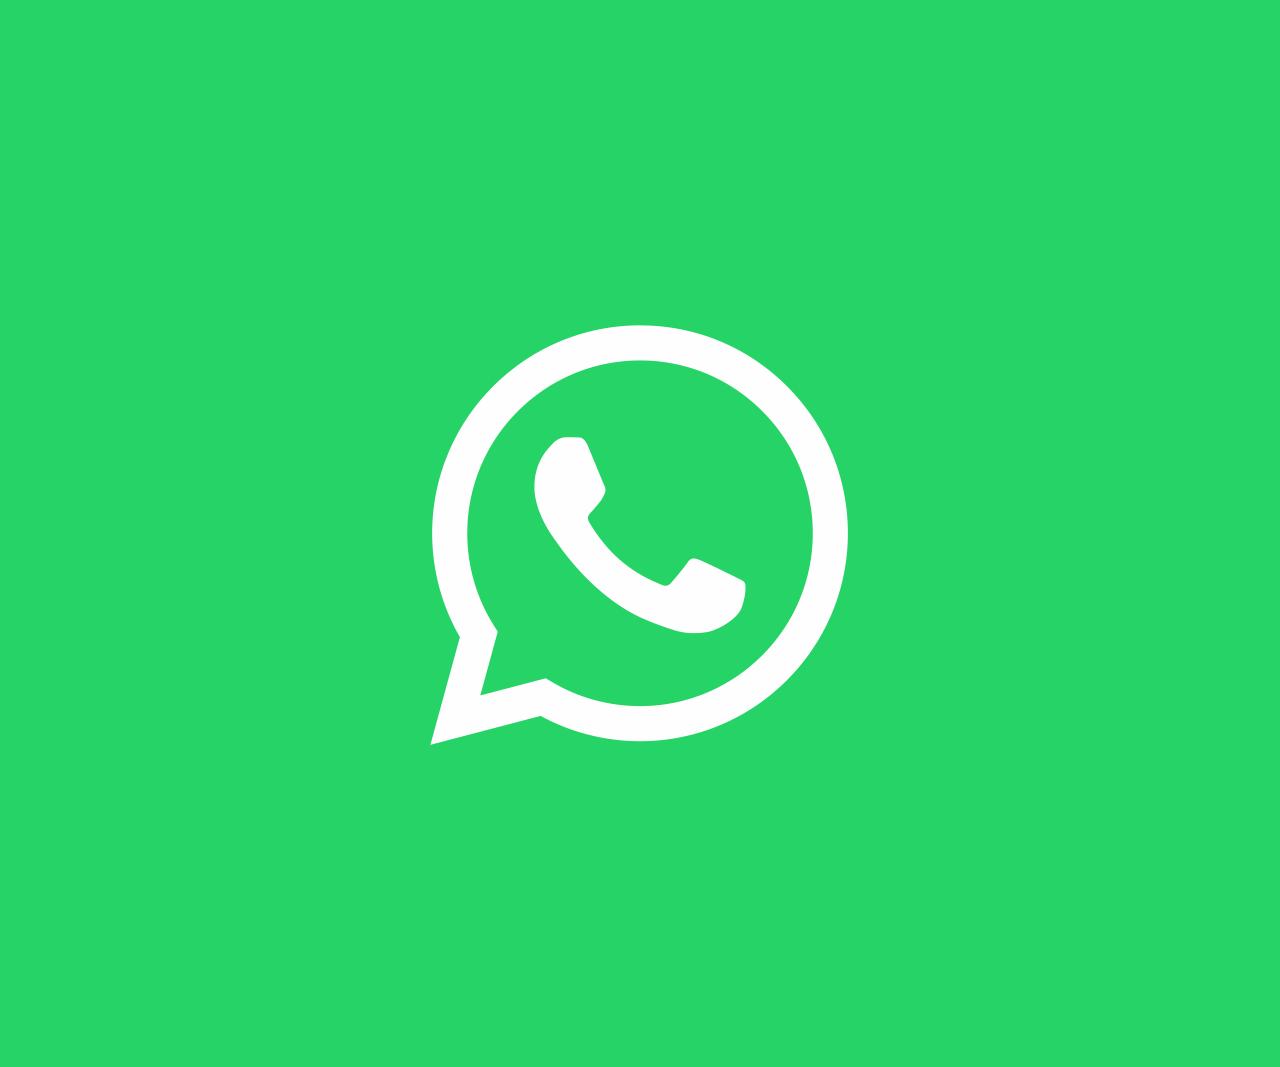 Powerseal WhatsApp